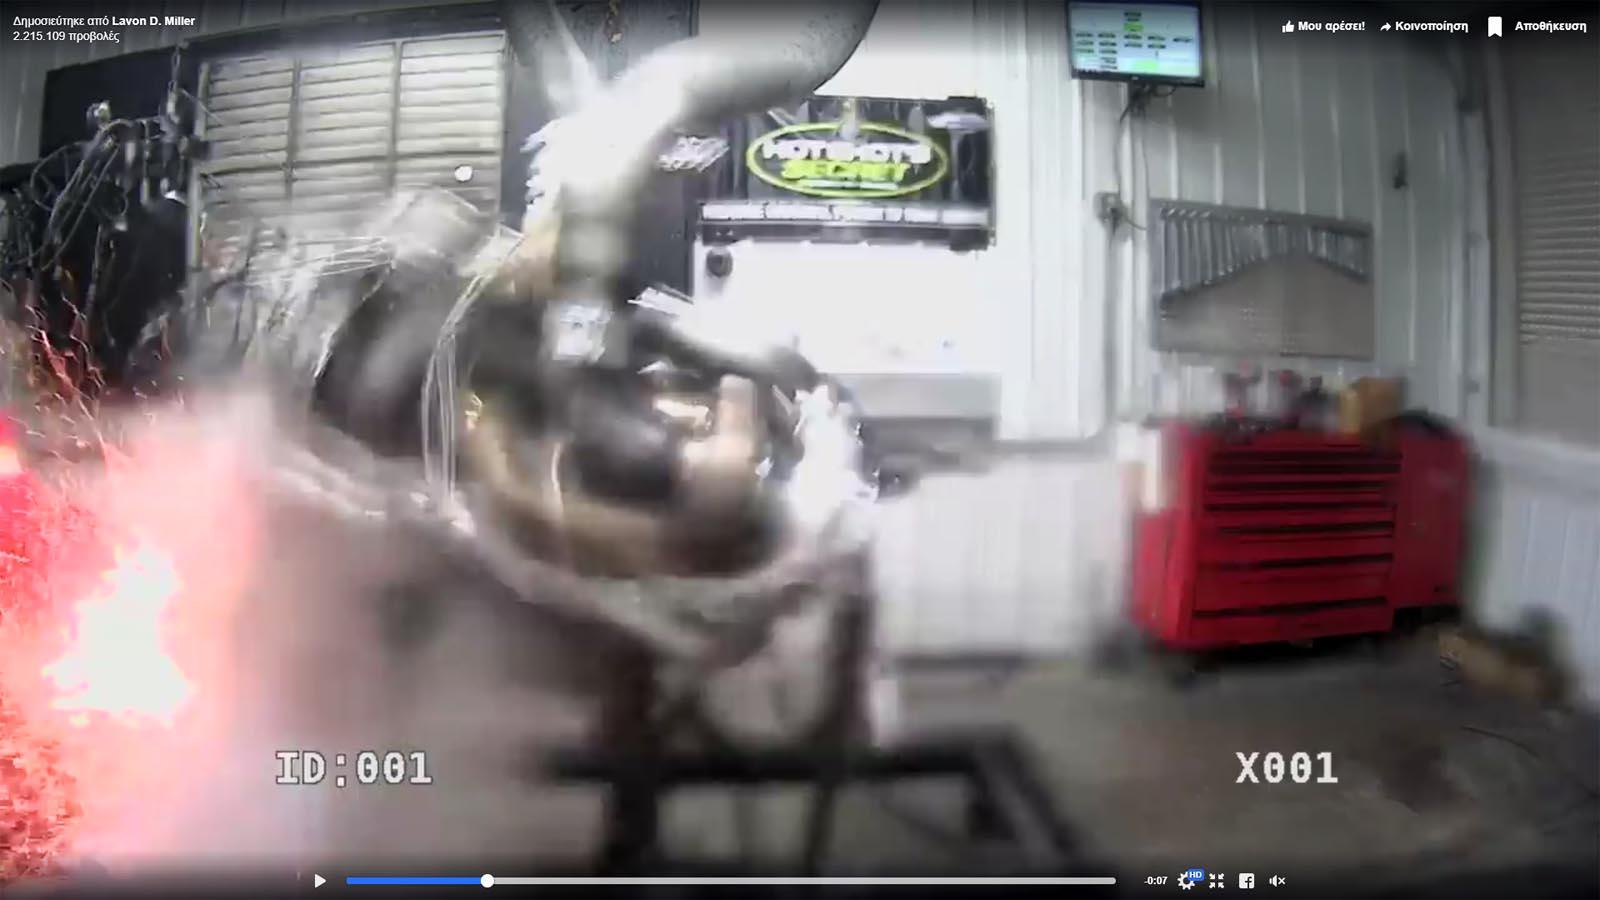 Photo of Δείτε ένα μοτέρ να σκάει στον πάγκο [vid]